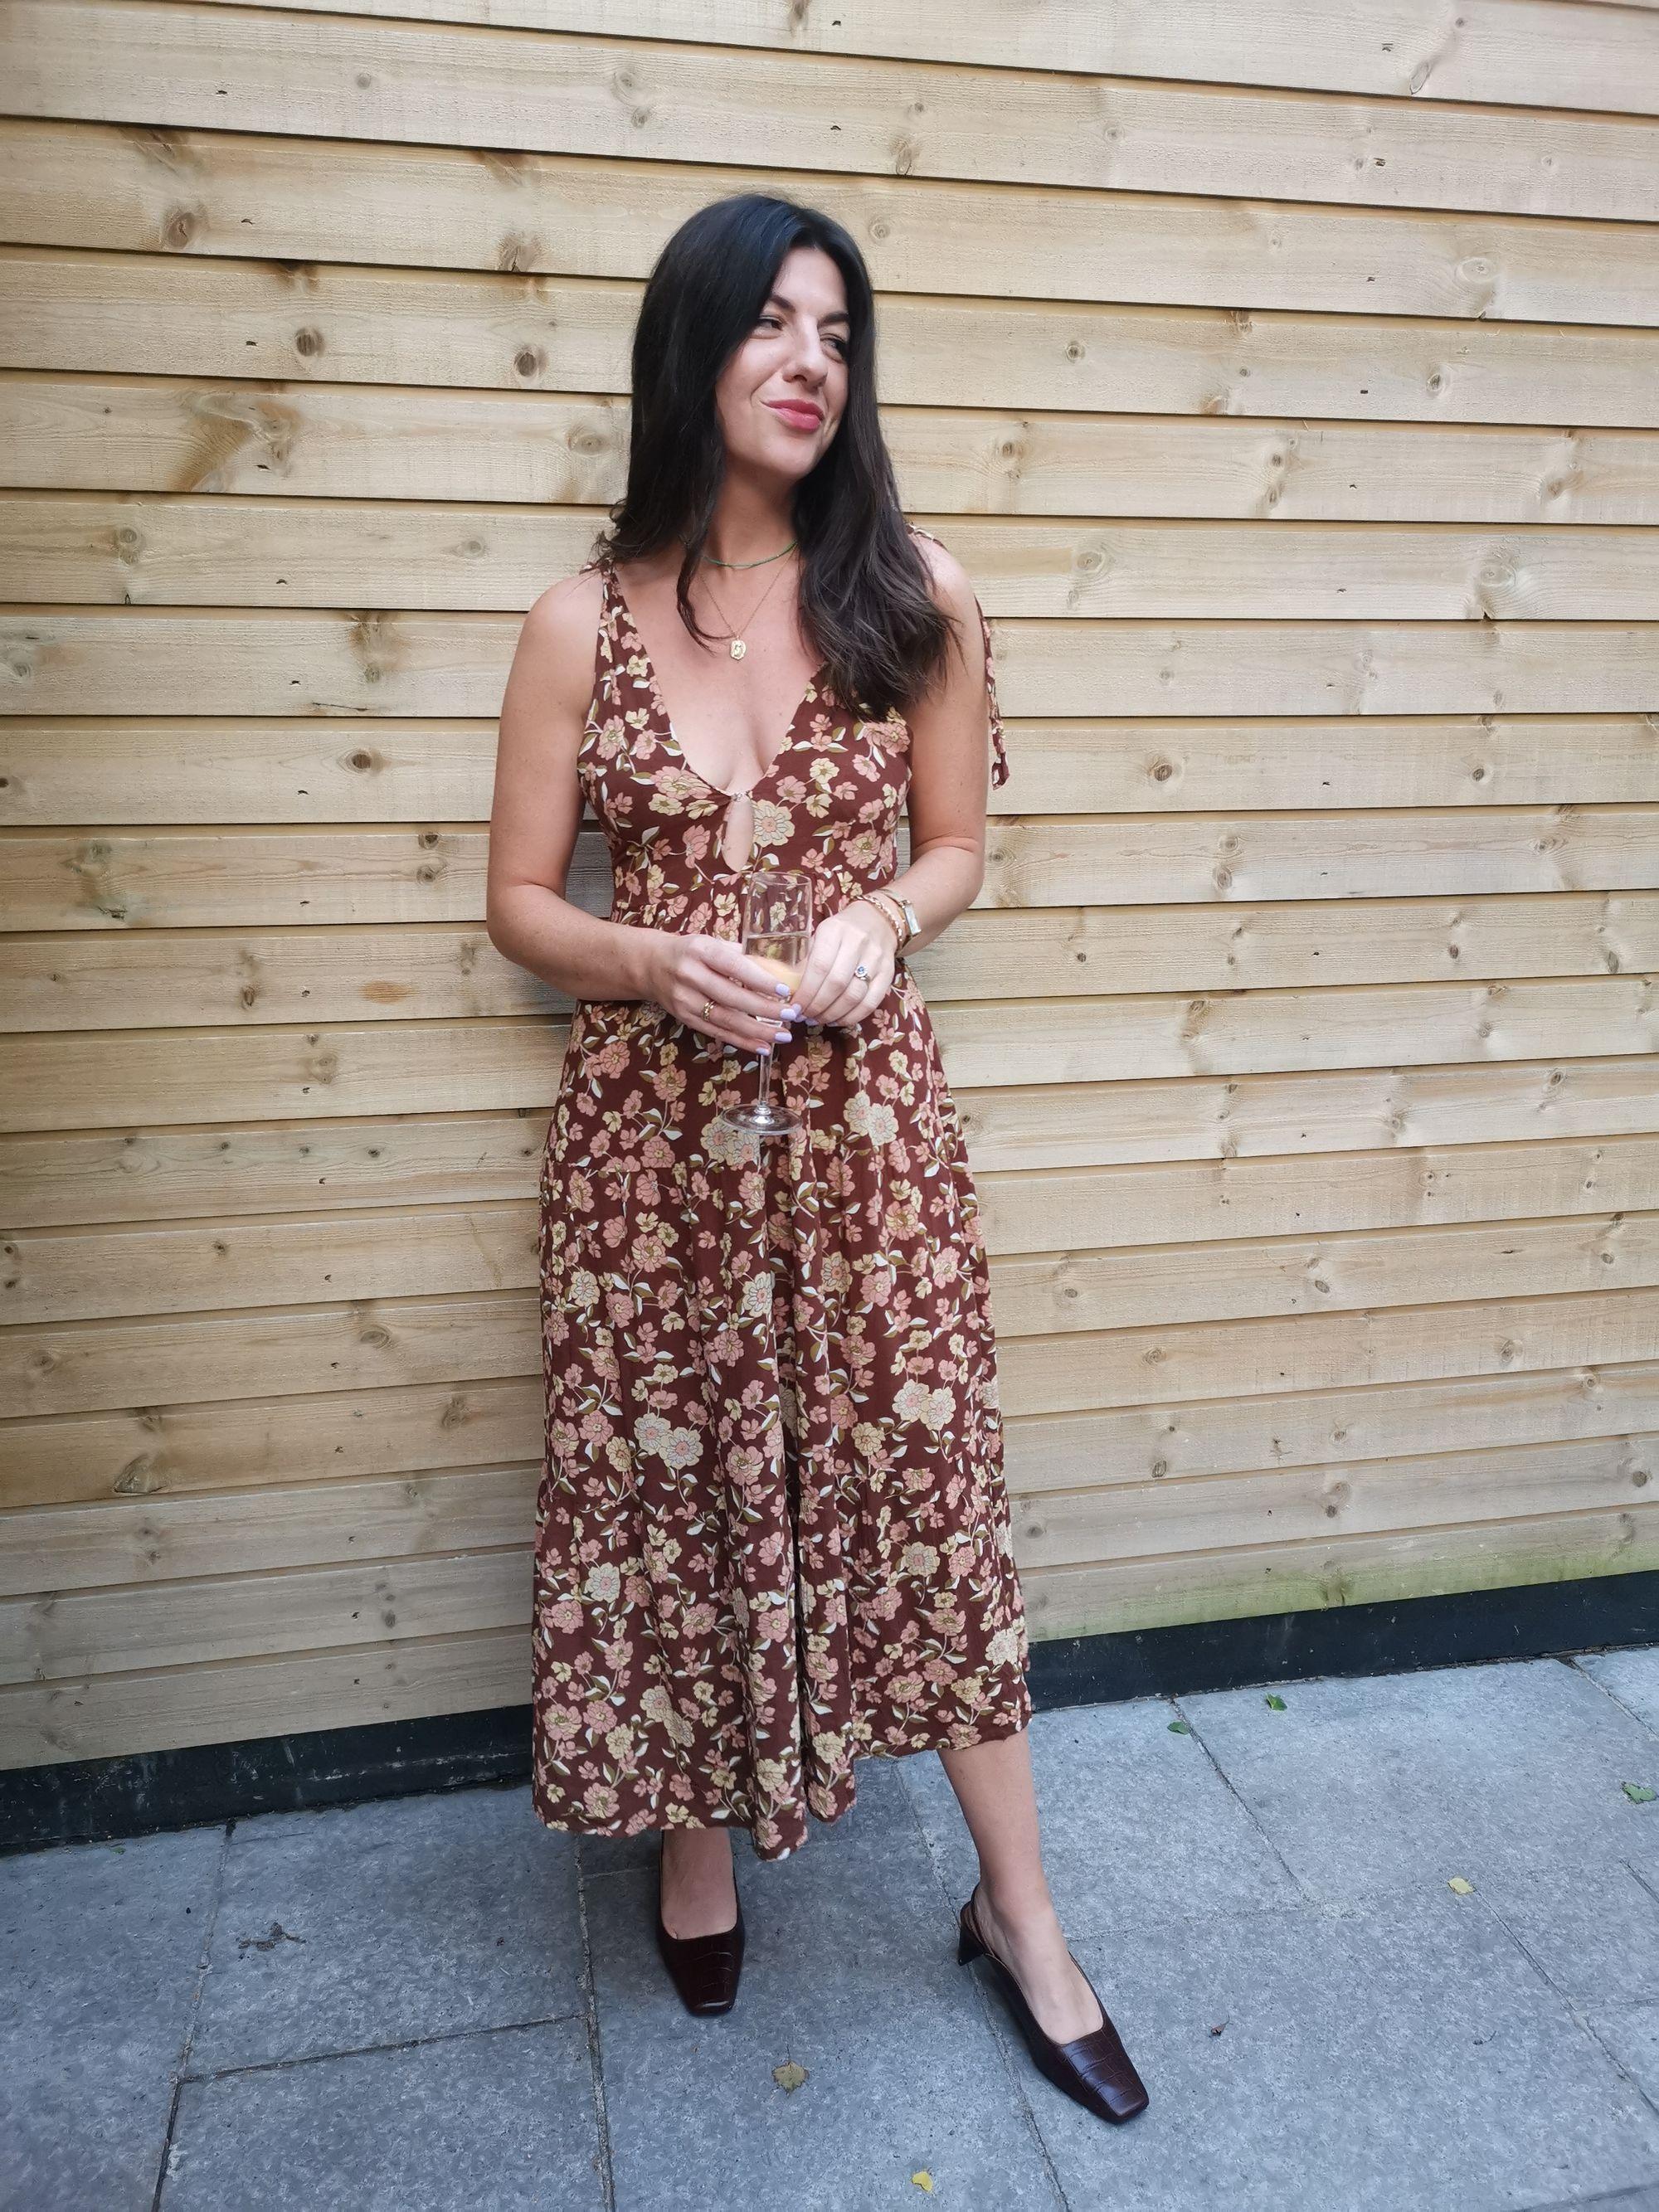 Francesca Saffari wearing Faithfull the brand rented dress